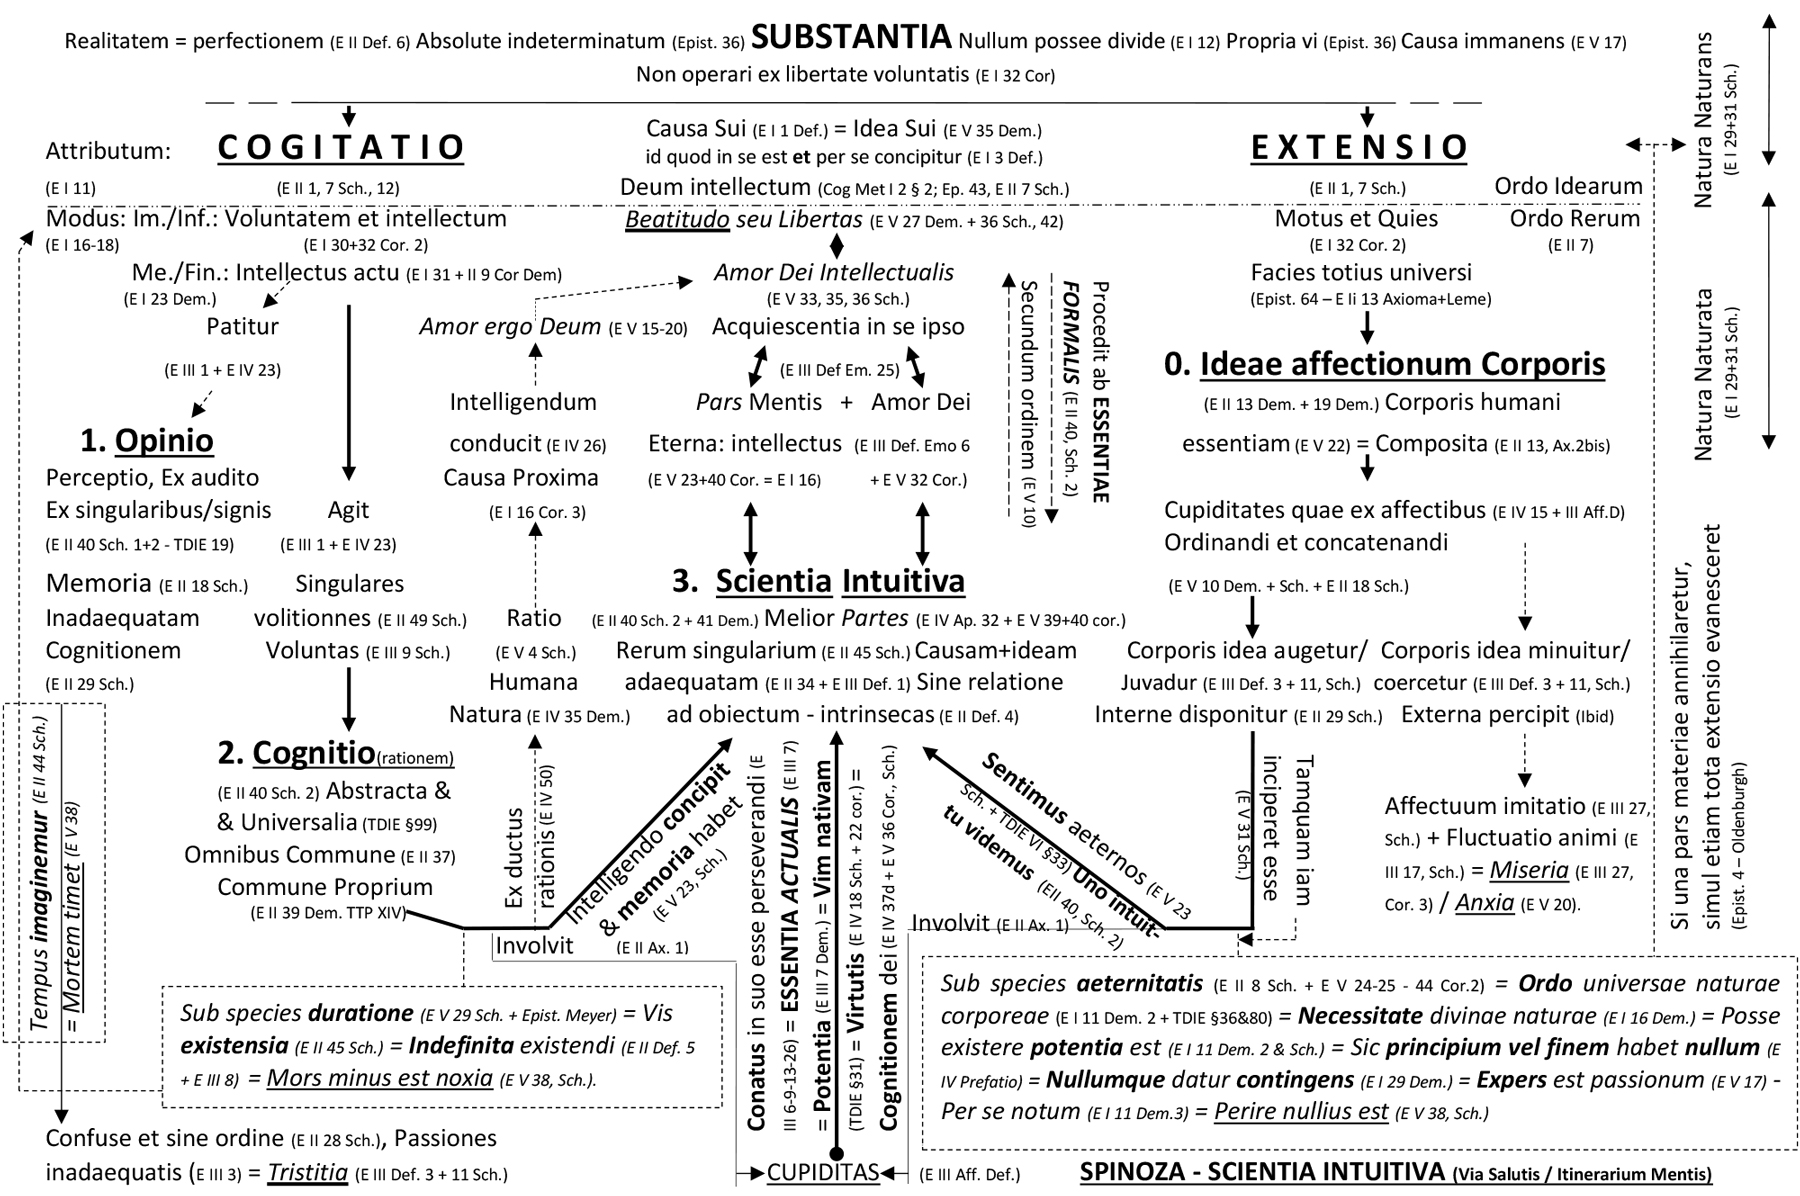 5. Spinoza – Scientia Intuitiva